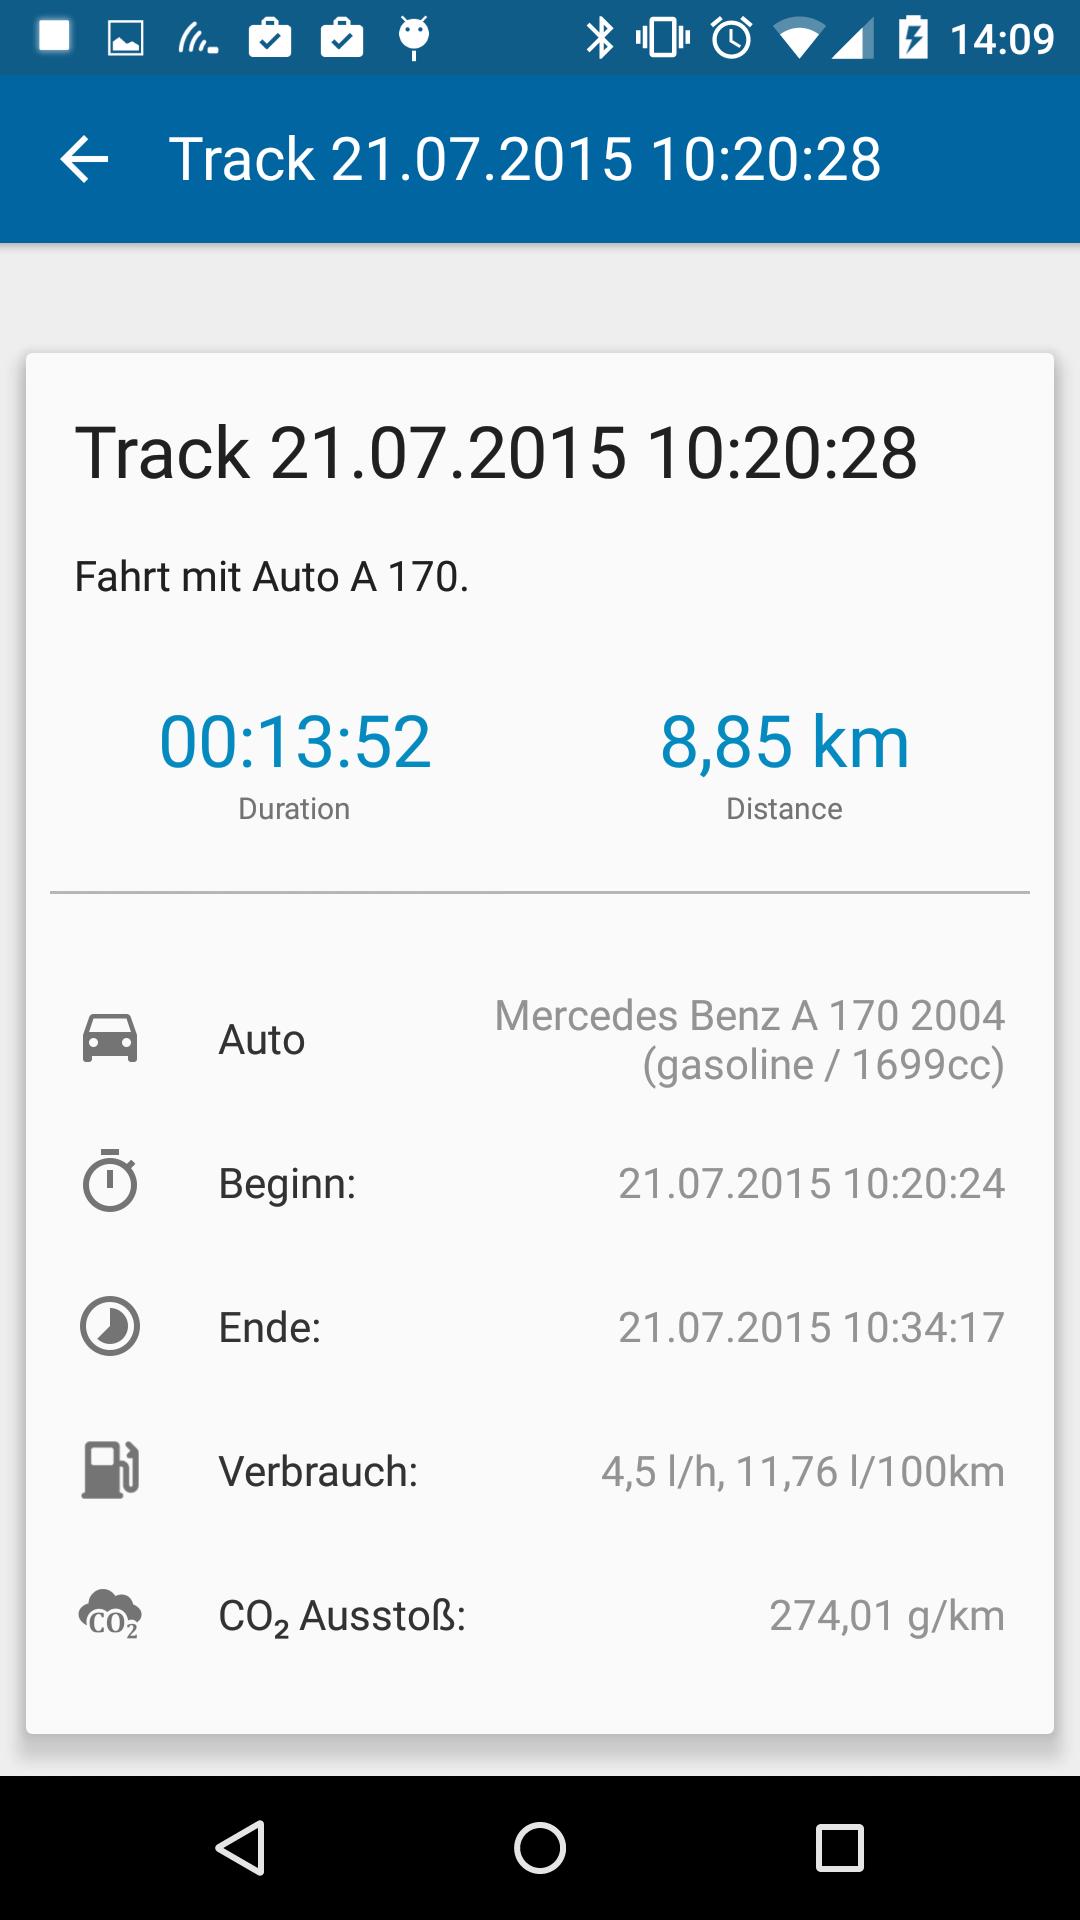 trackdetails_3.png